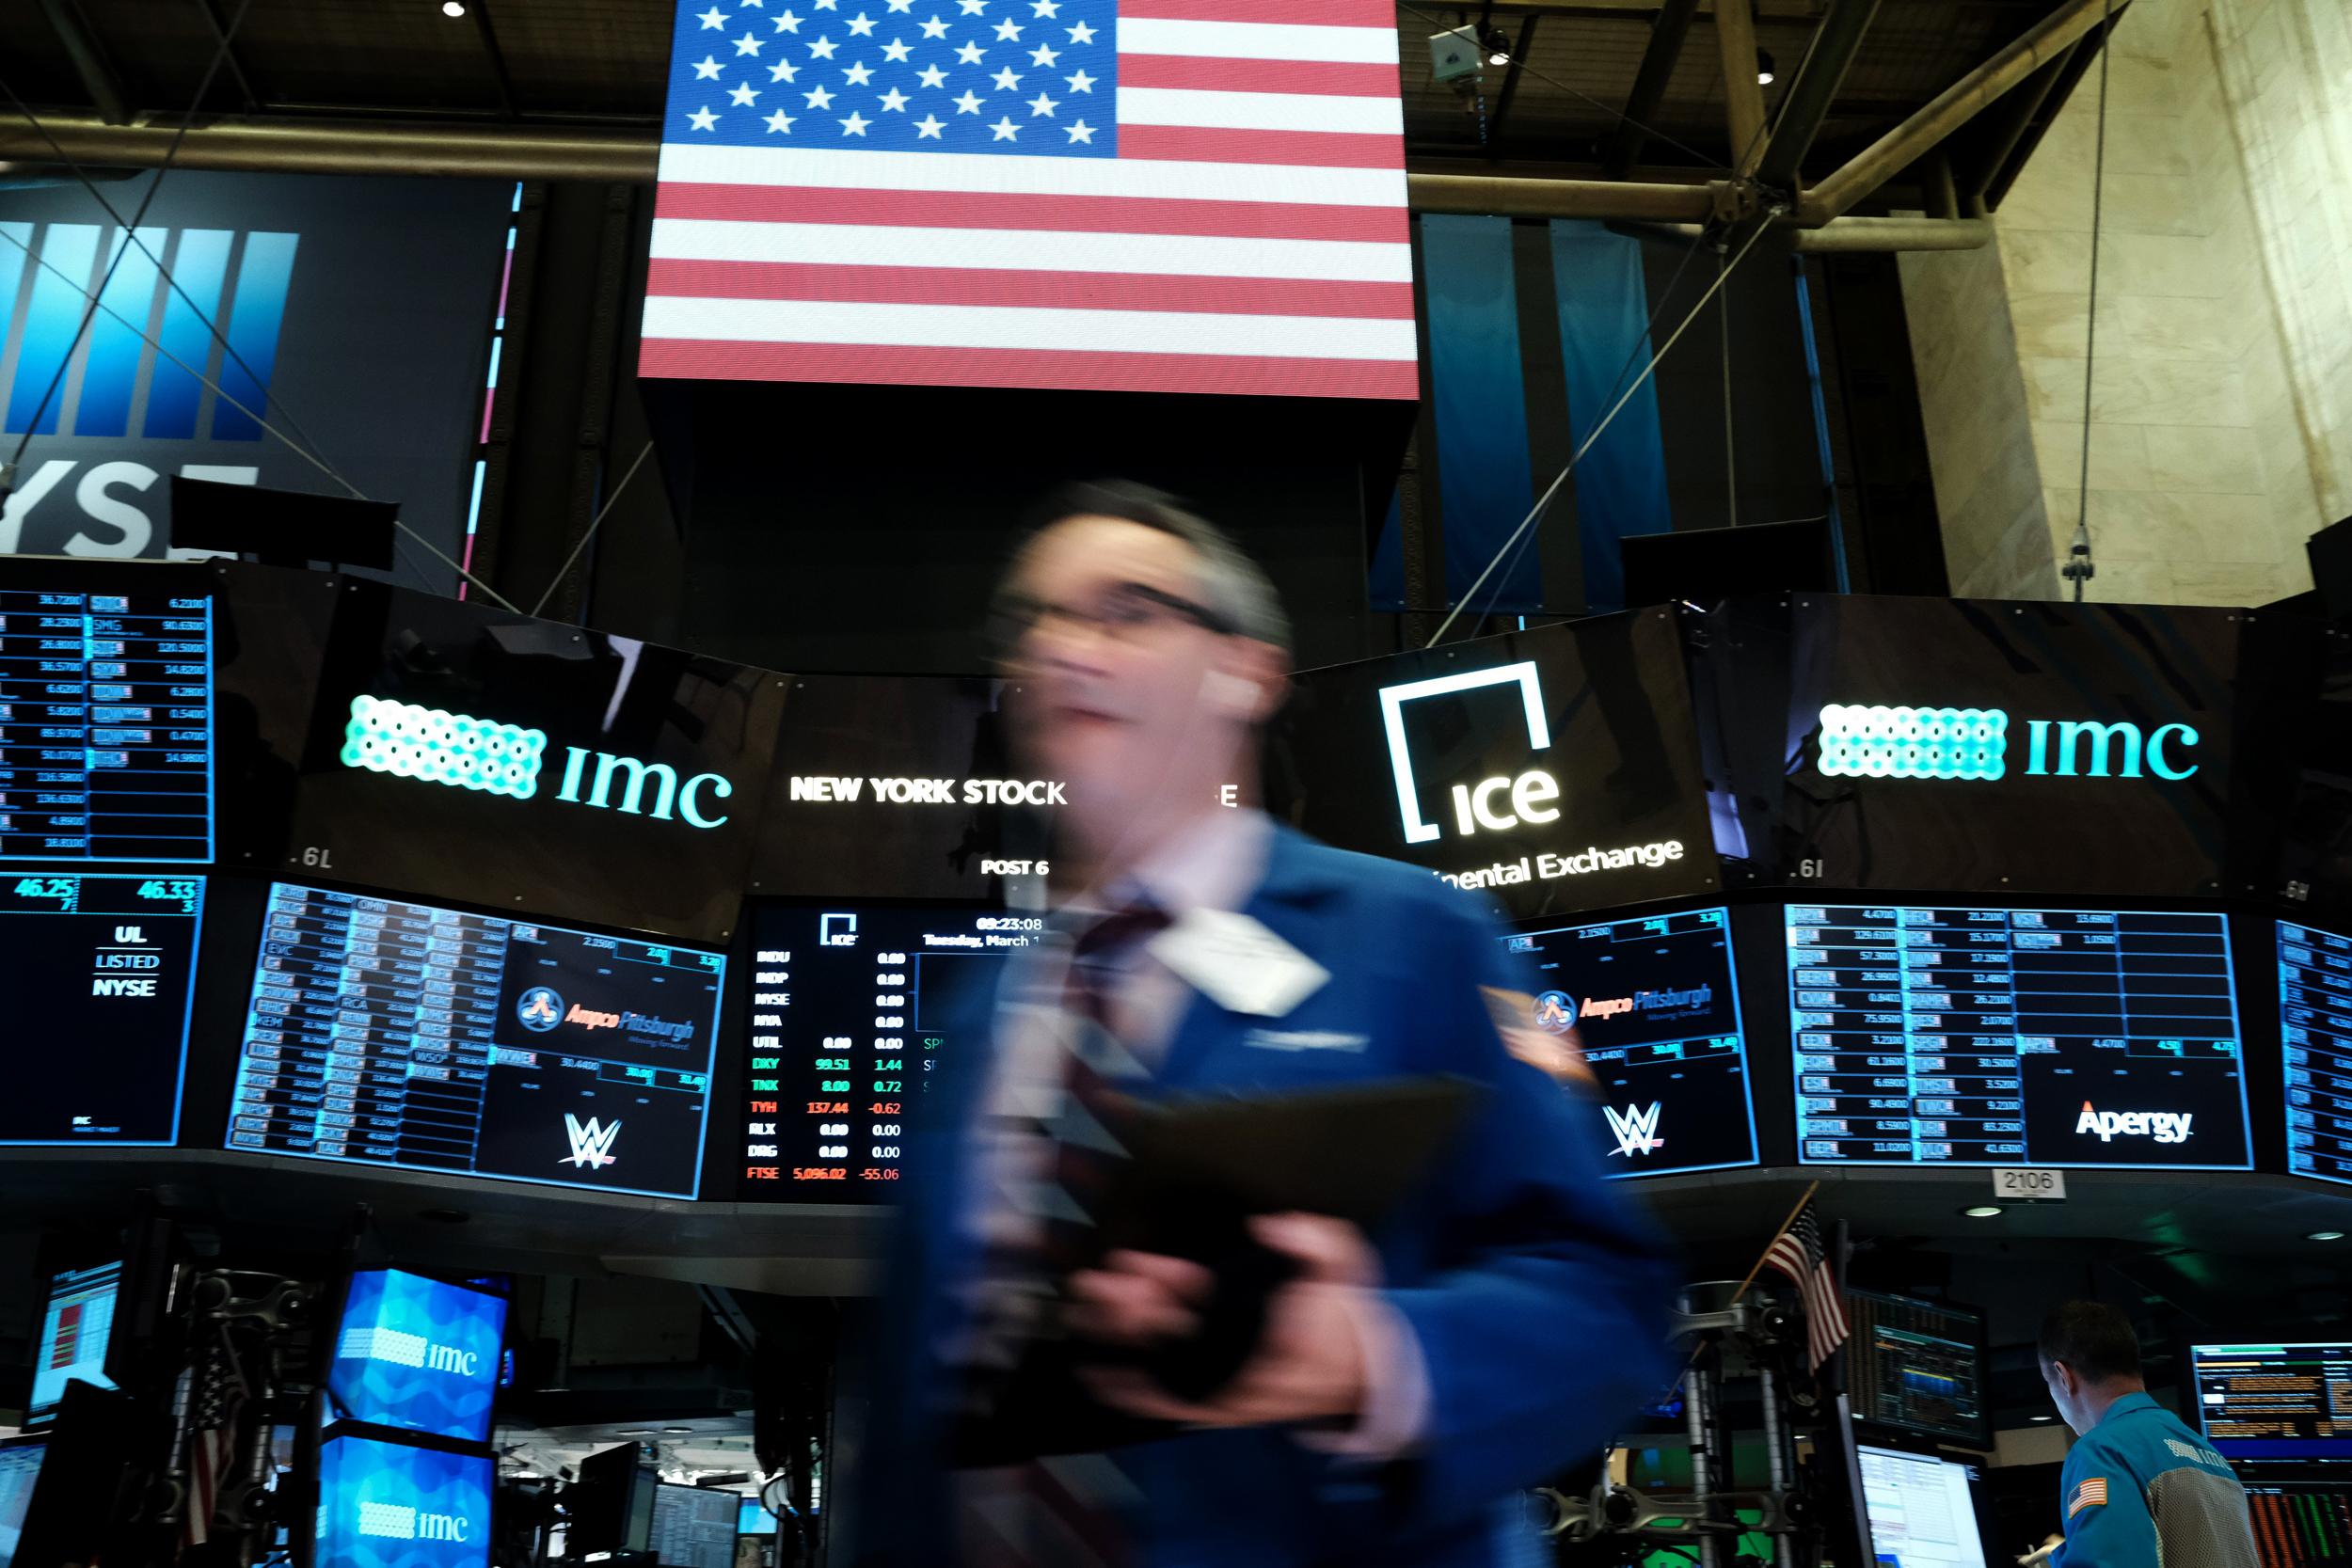 New York Stock Exchange closes trading